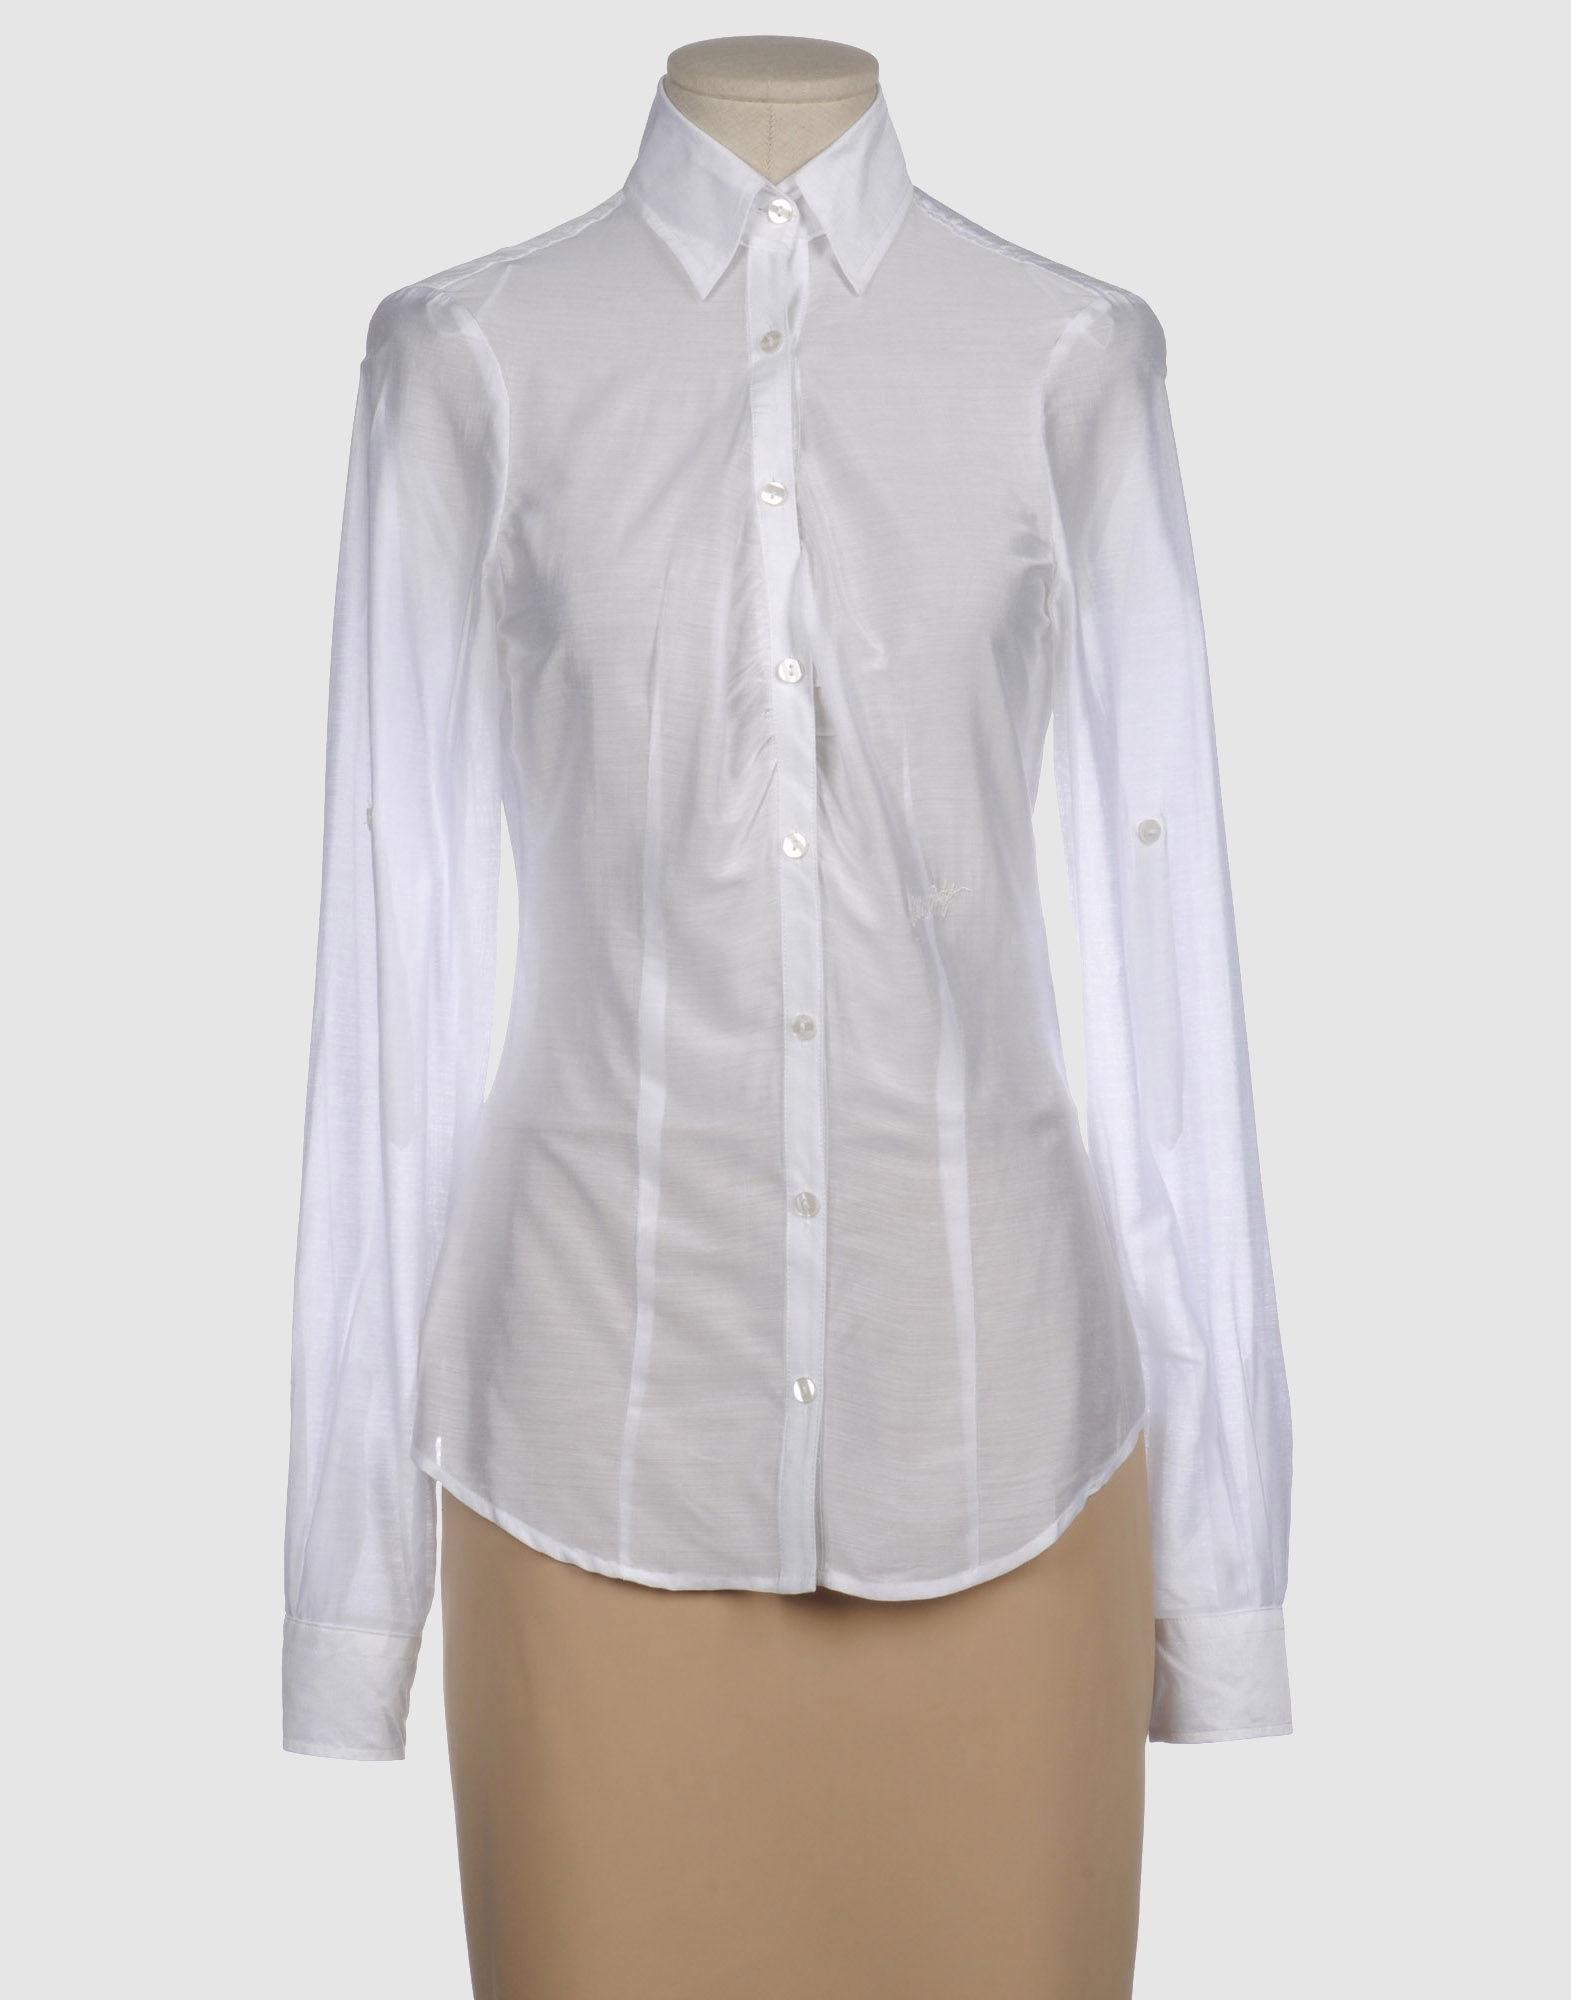 Miss Sixty Long Sleeve Shirts